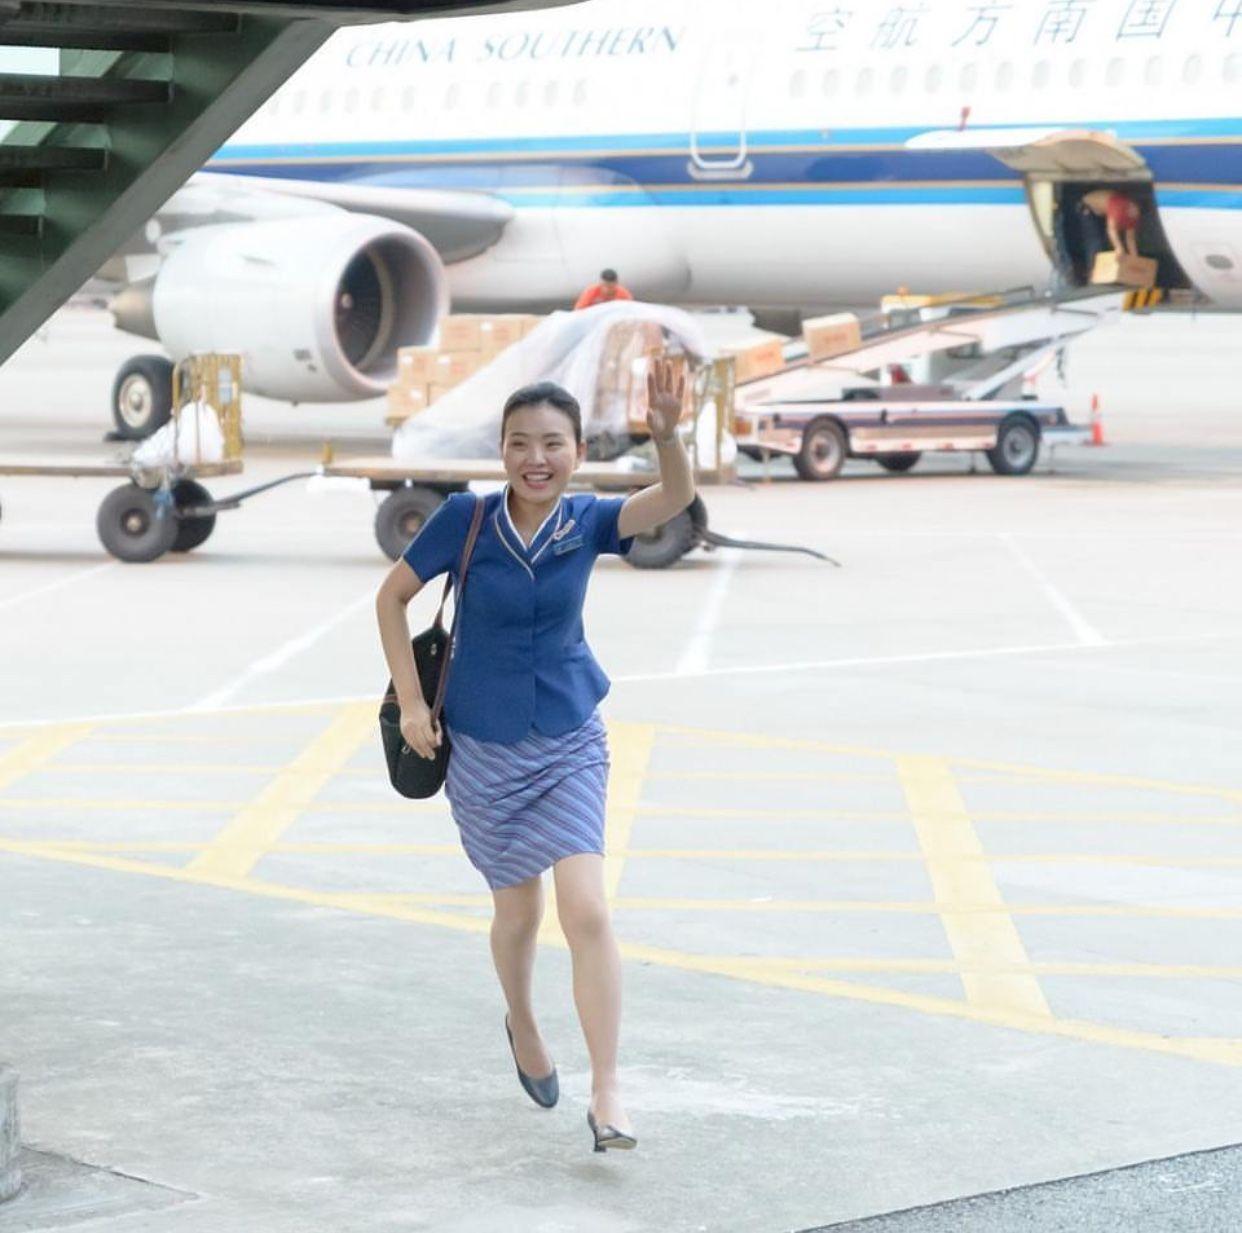 【China】 China Southern Airlines cabin crew / 中国南方航空 客室乗務員